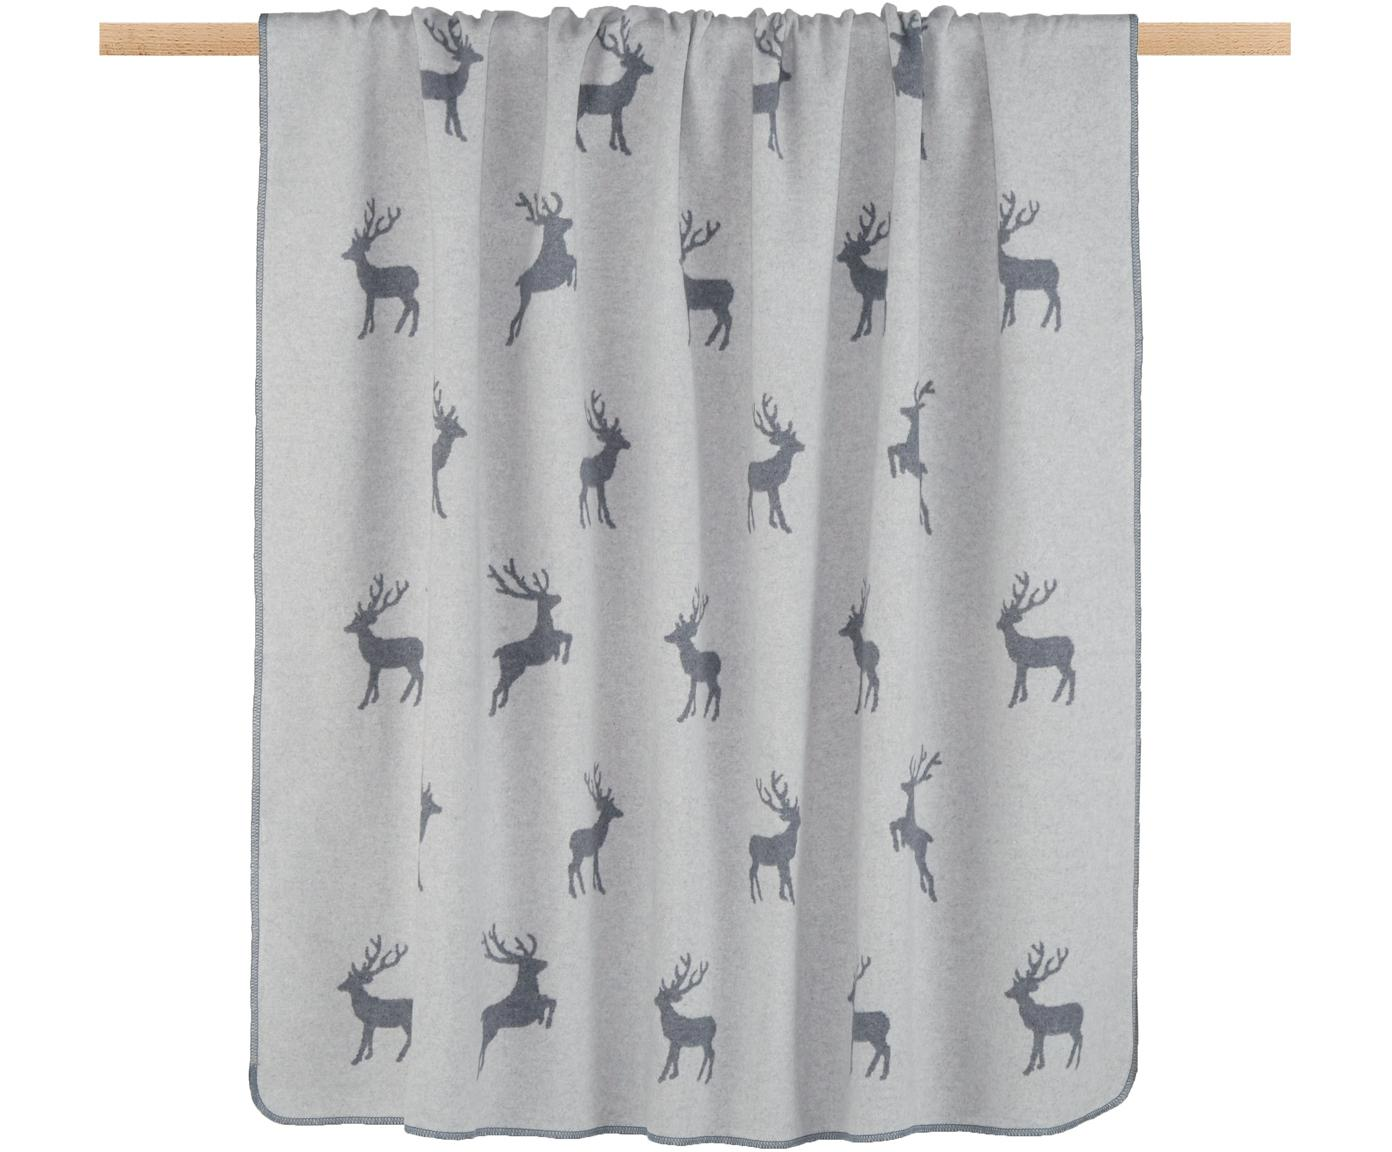 Manta doble cara de tela polar Silvretta Hirsch, 85%algodón, 8%viscosa, 7%poliacrílico, Antracita, gris, An 140 x L 200 cm